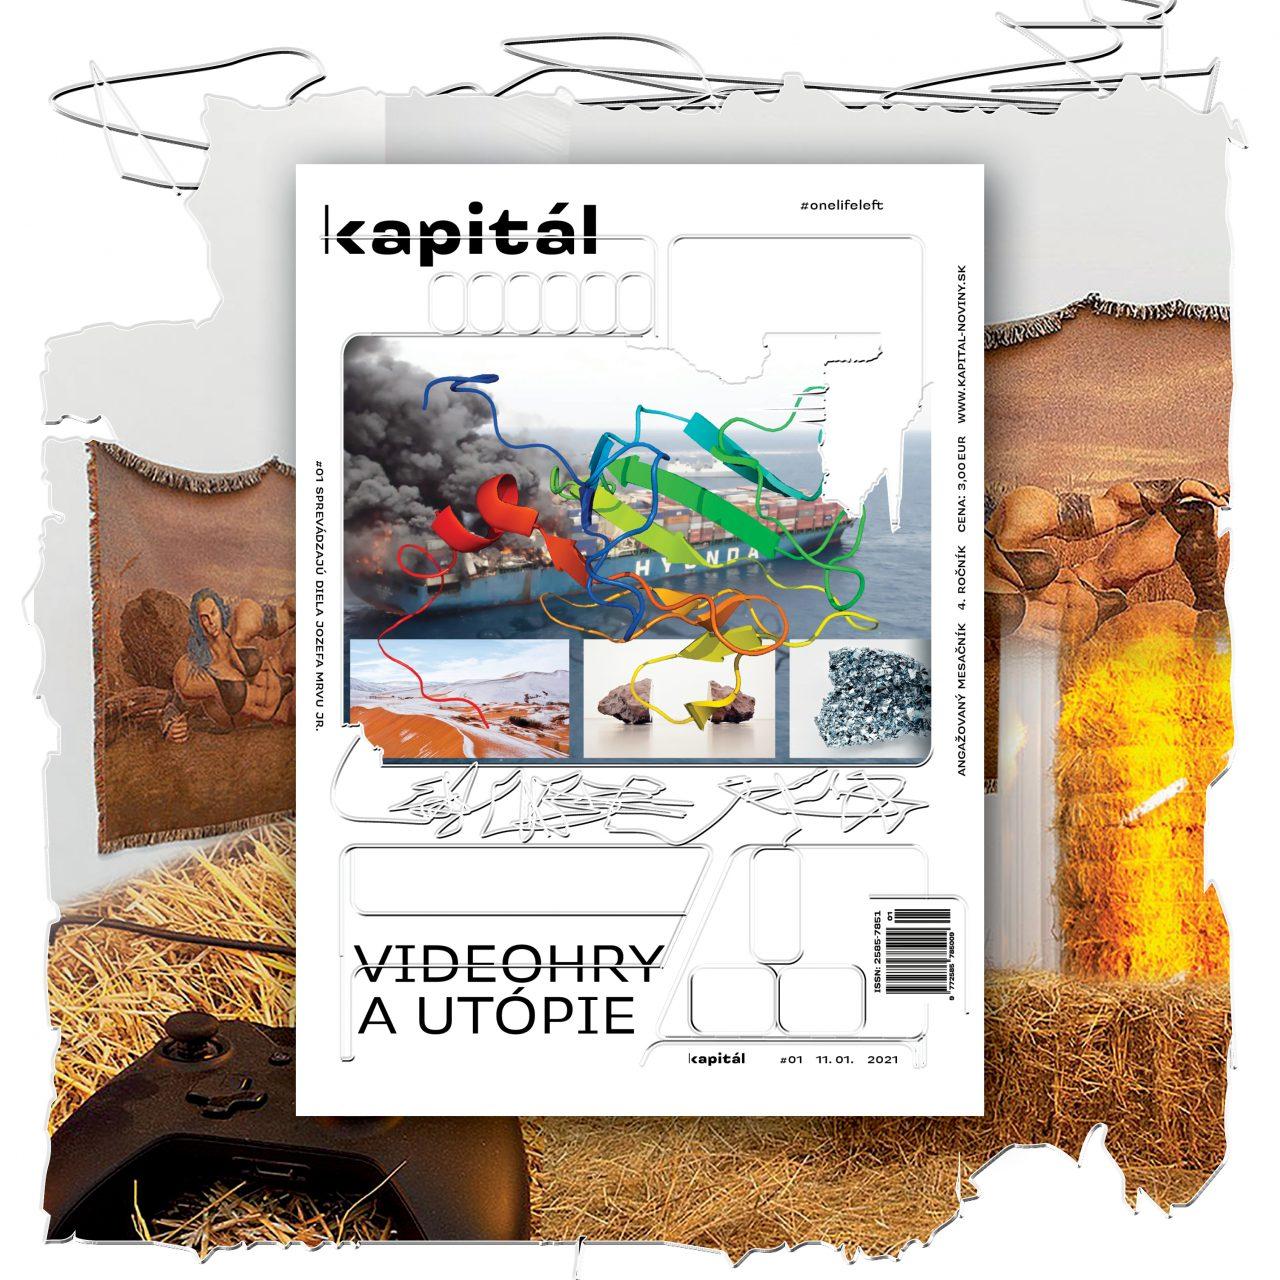 https://kapital-noviny.sk/wp-content/uploads/2021/01/stvorec-obalka-1280x1280.jpg